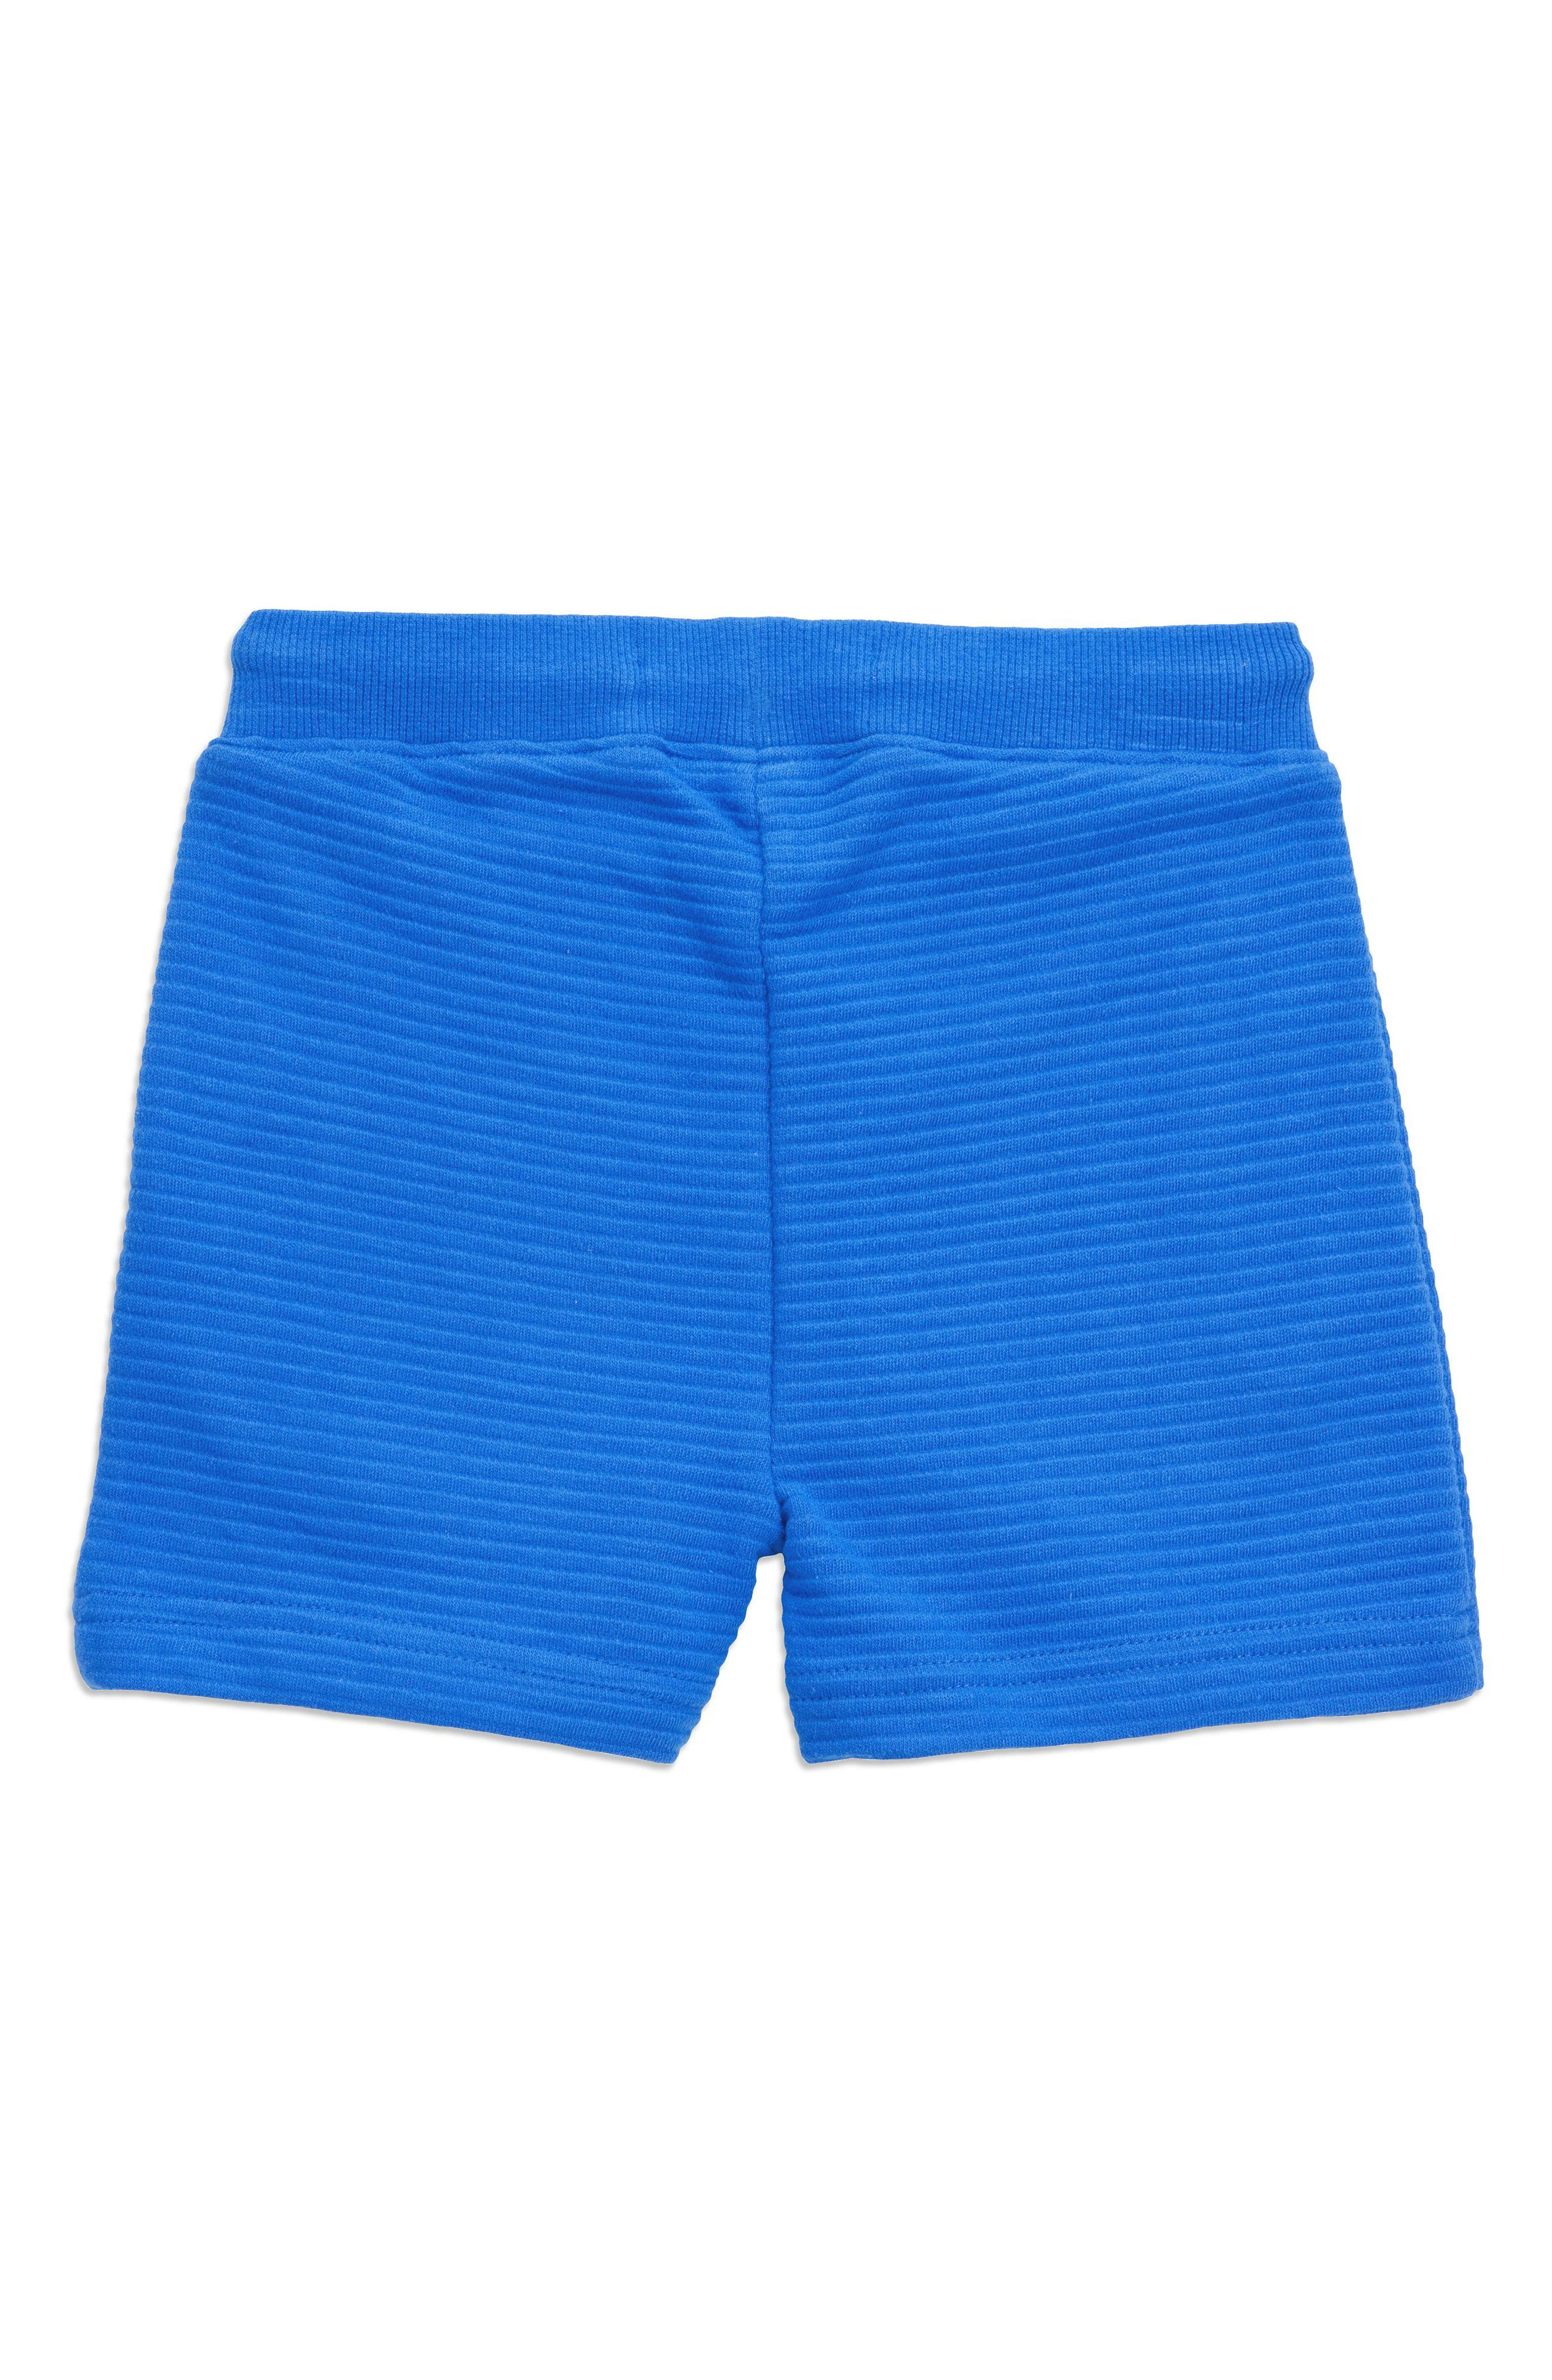 Academy Shorts,                             Alternate thumbnail 2, color,                             430